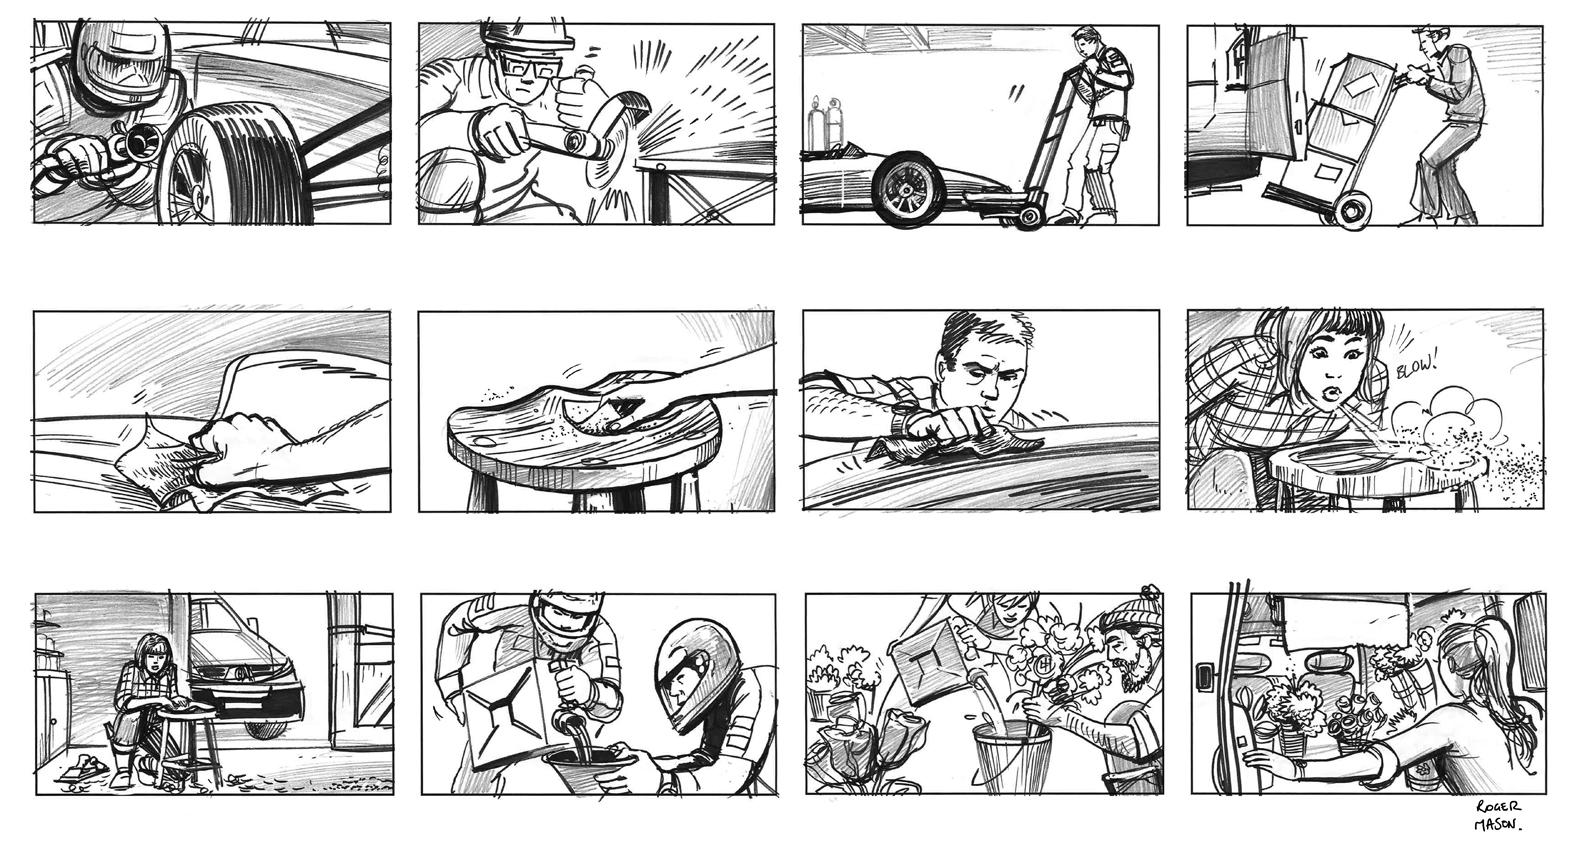 Storyboard artist - Roger Mason; storyboard artist, illustrator